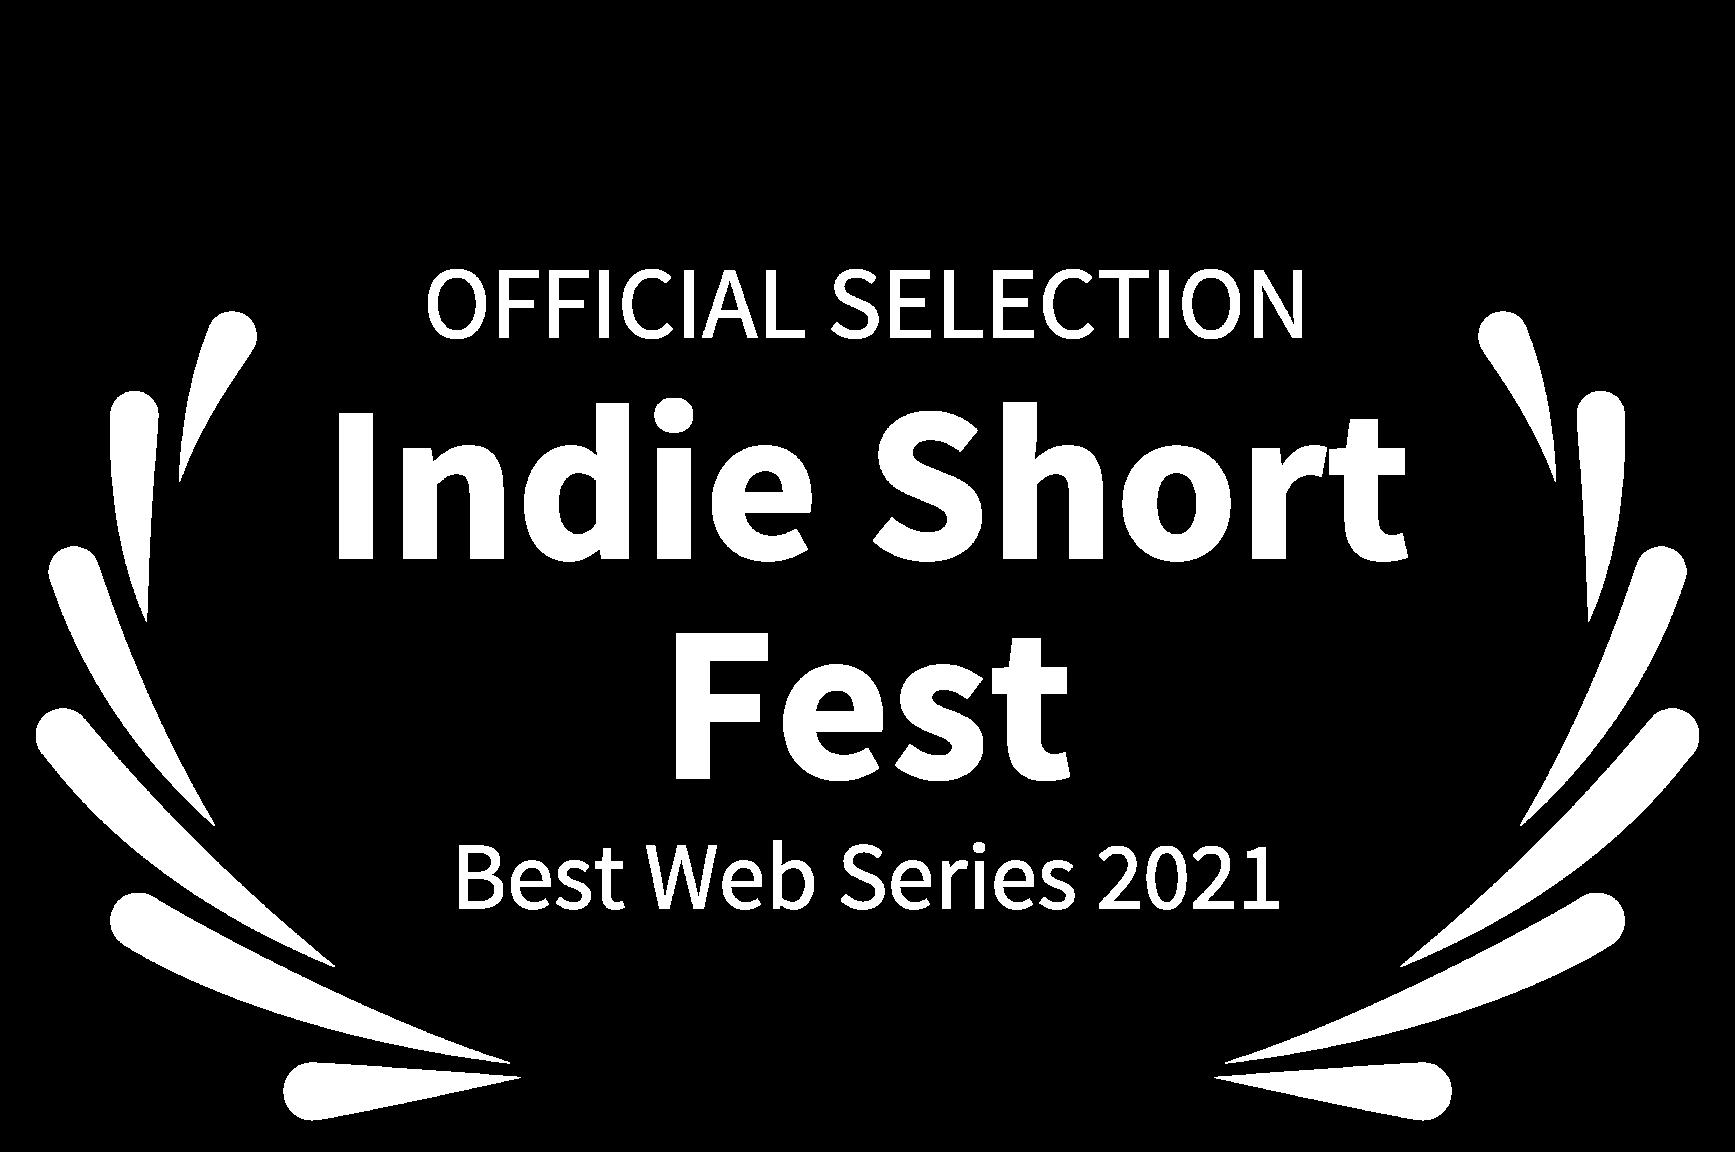 OFFICIAL SELECTION - Indie Short Fest - Best Web Series 2021 (1)